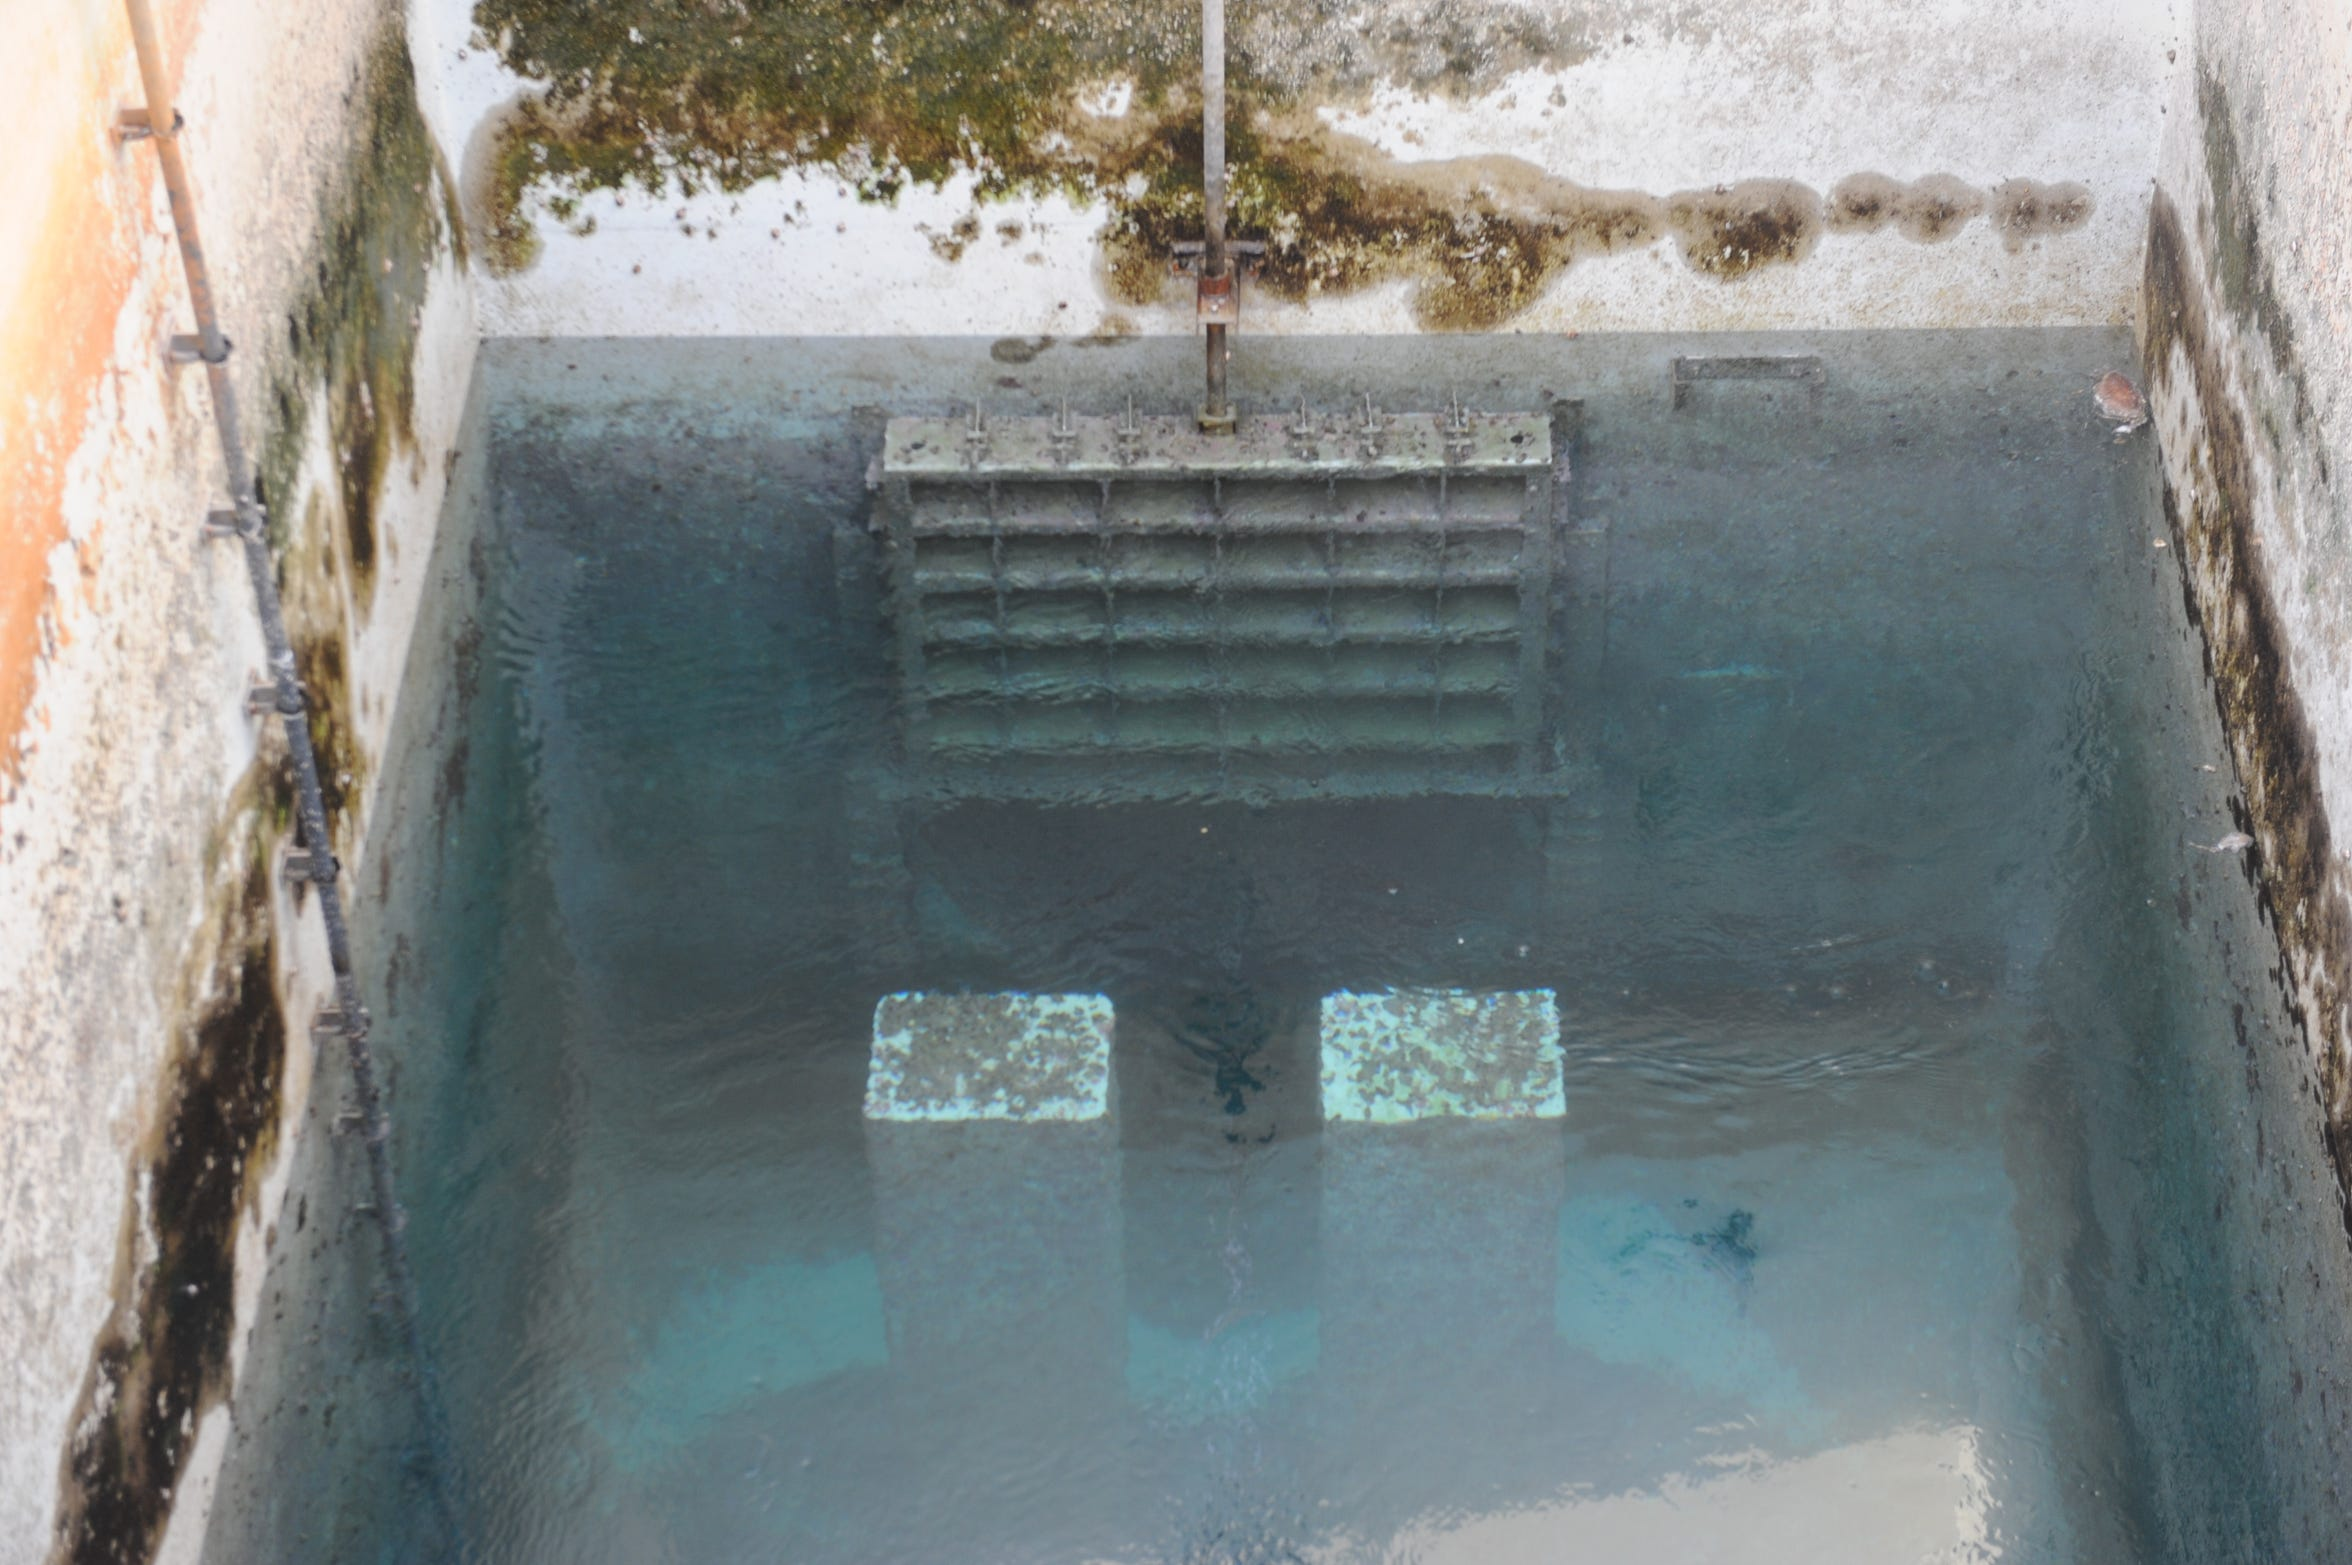 Seawater fills a tank at the Barka 4 desalination plant in Oman.